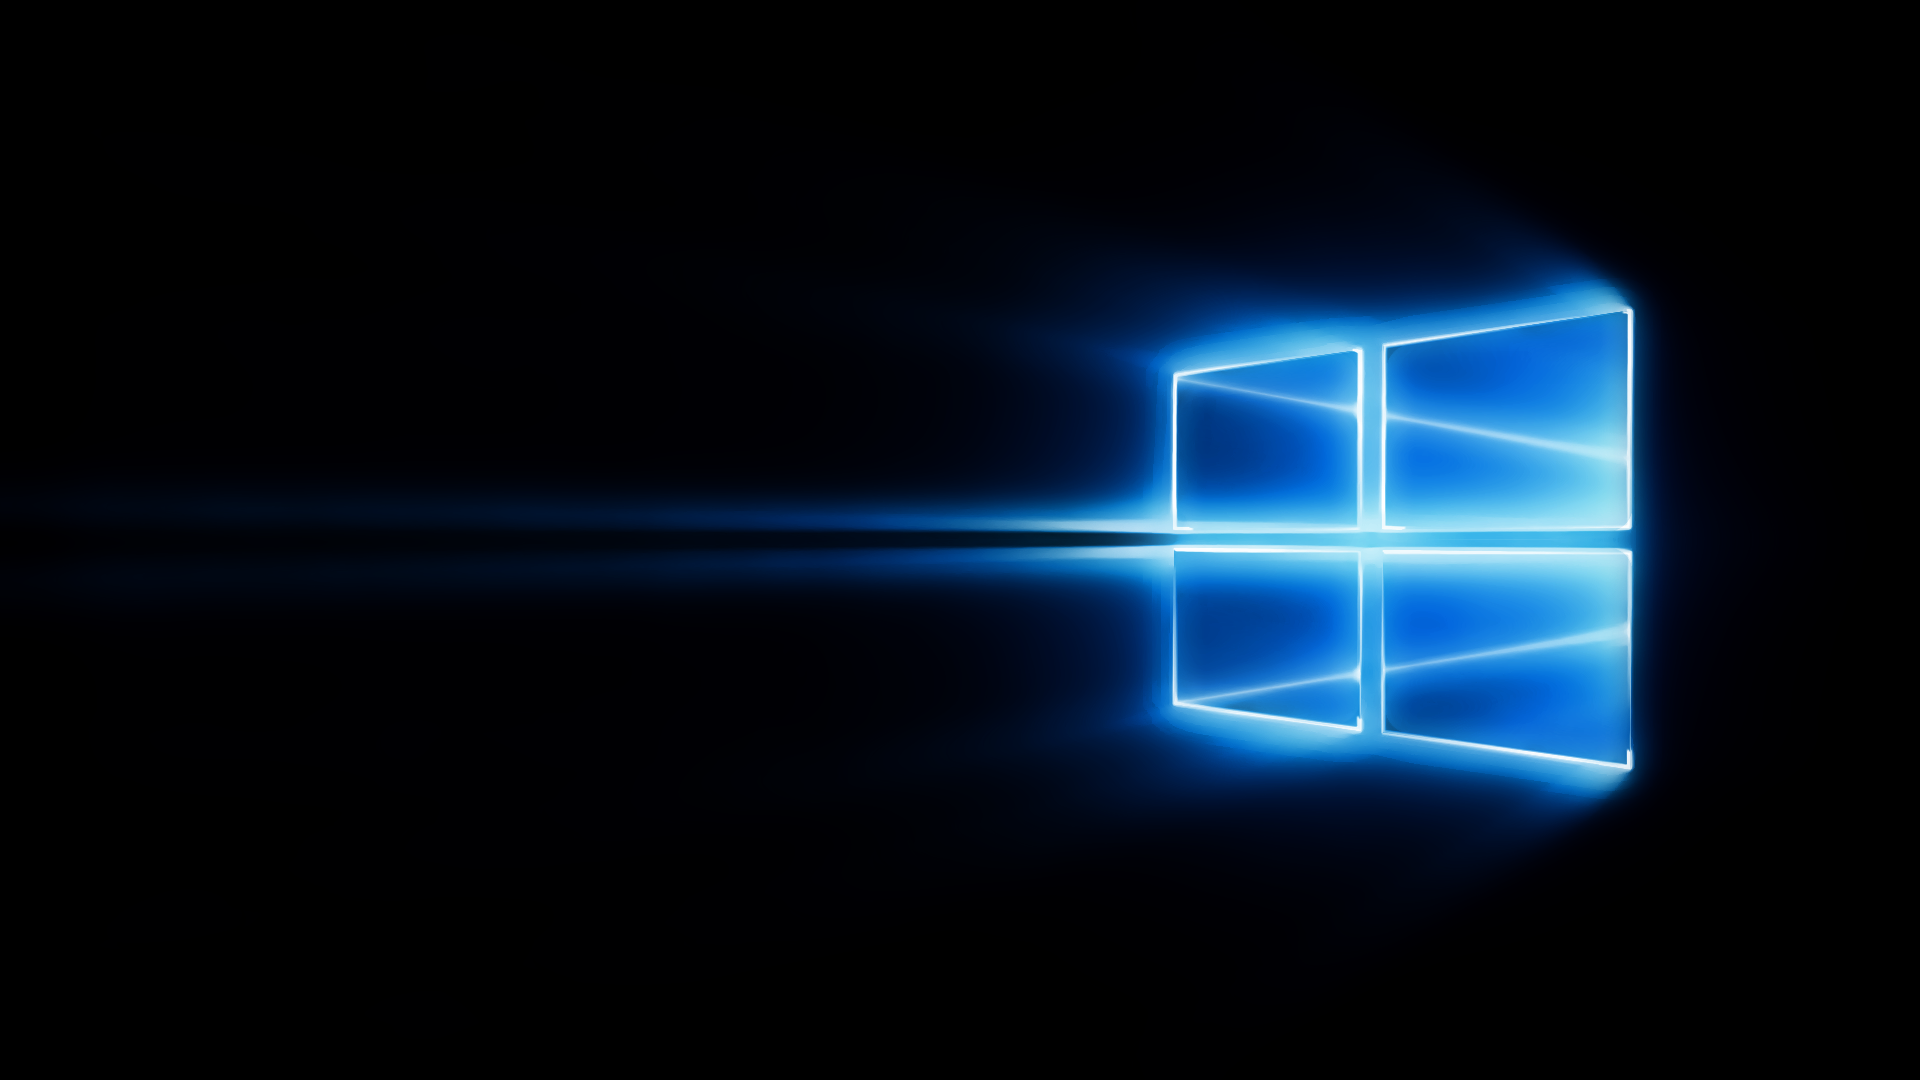 Hd wallpaper sites - Windows 10 Wallpaper Free Hd 2873 Hd Wallpapers Site